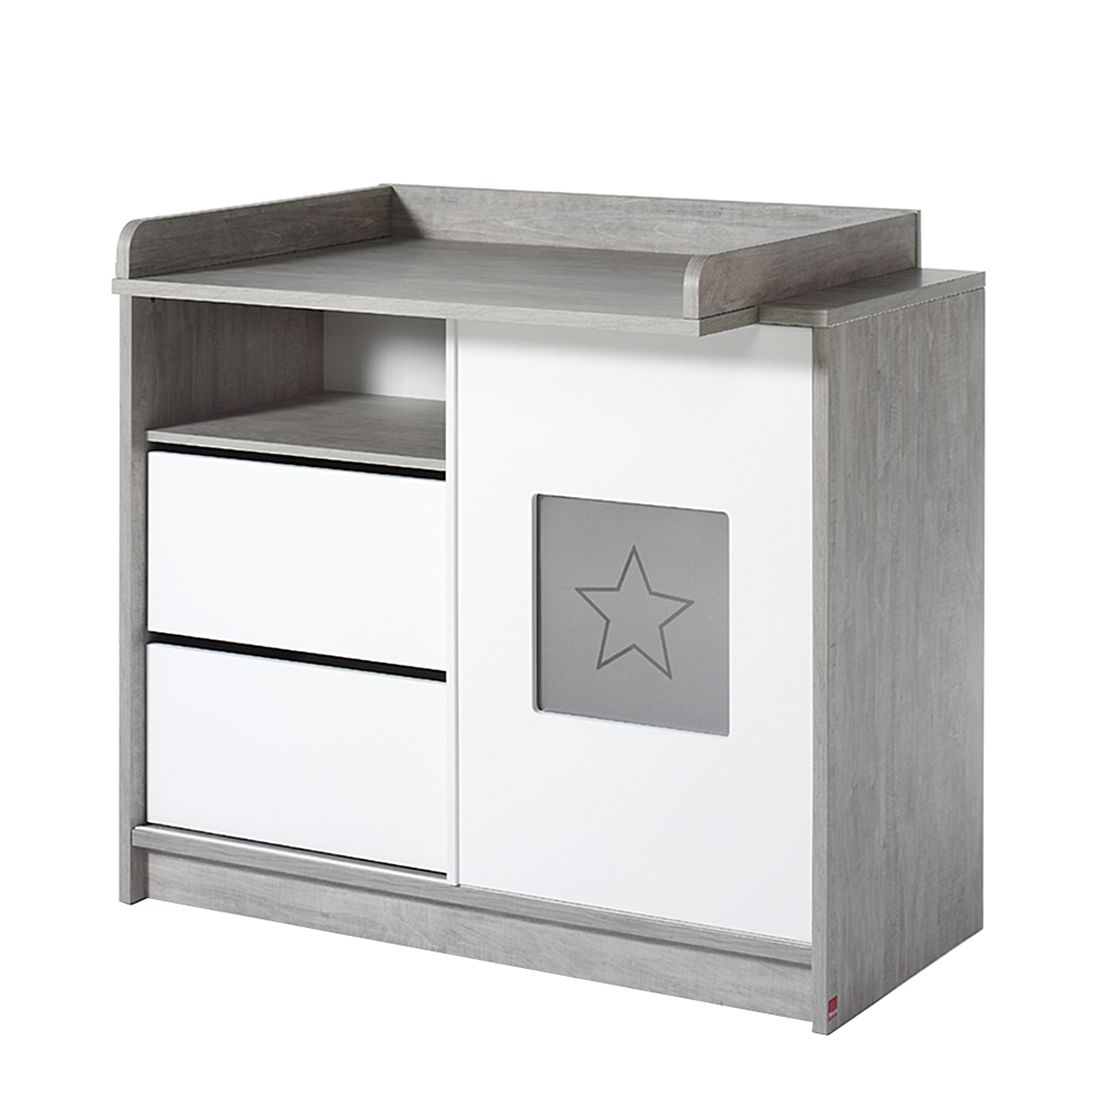 wickelkommode eco star driftwood wei wickelkommode eco melamin dekor dekor driftwood. Black Bedroom Furniture Sets. Home Design Ideas